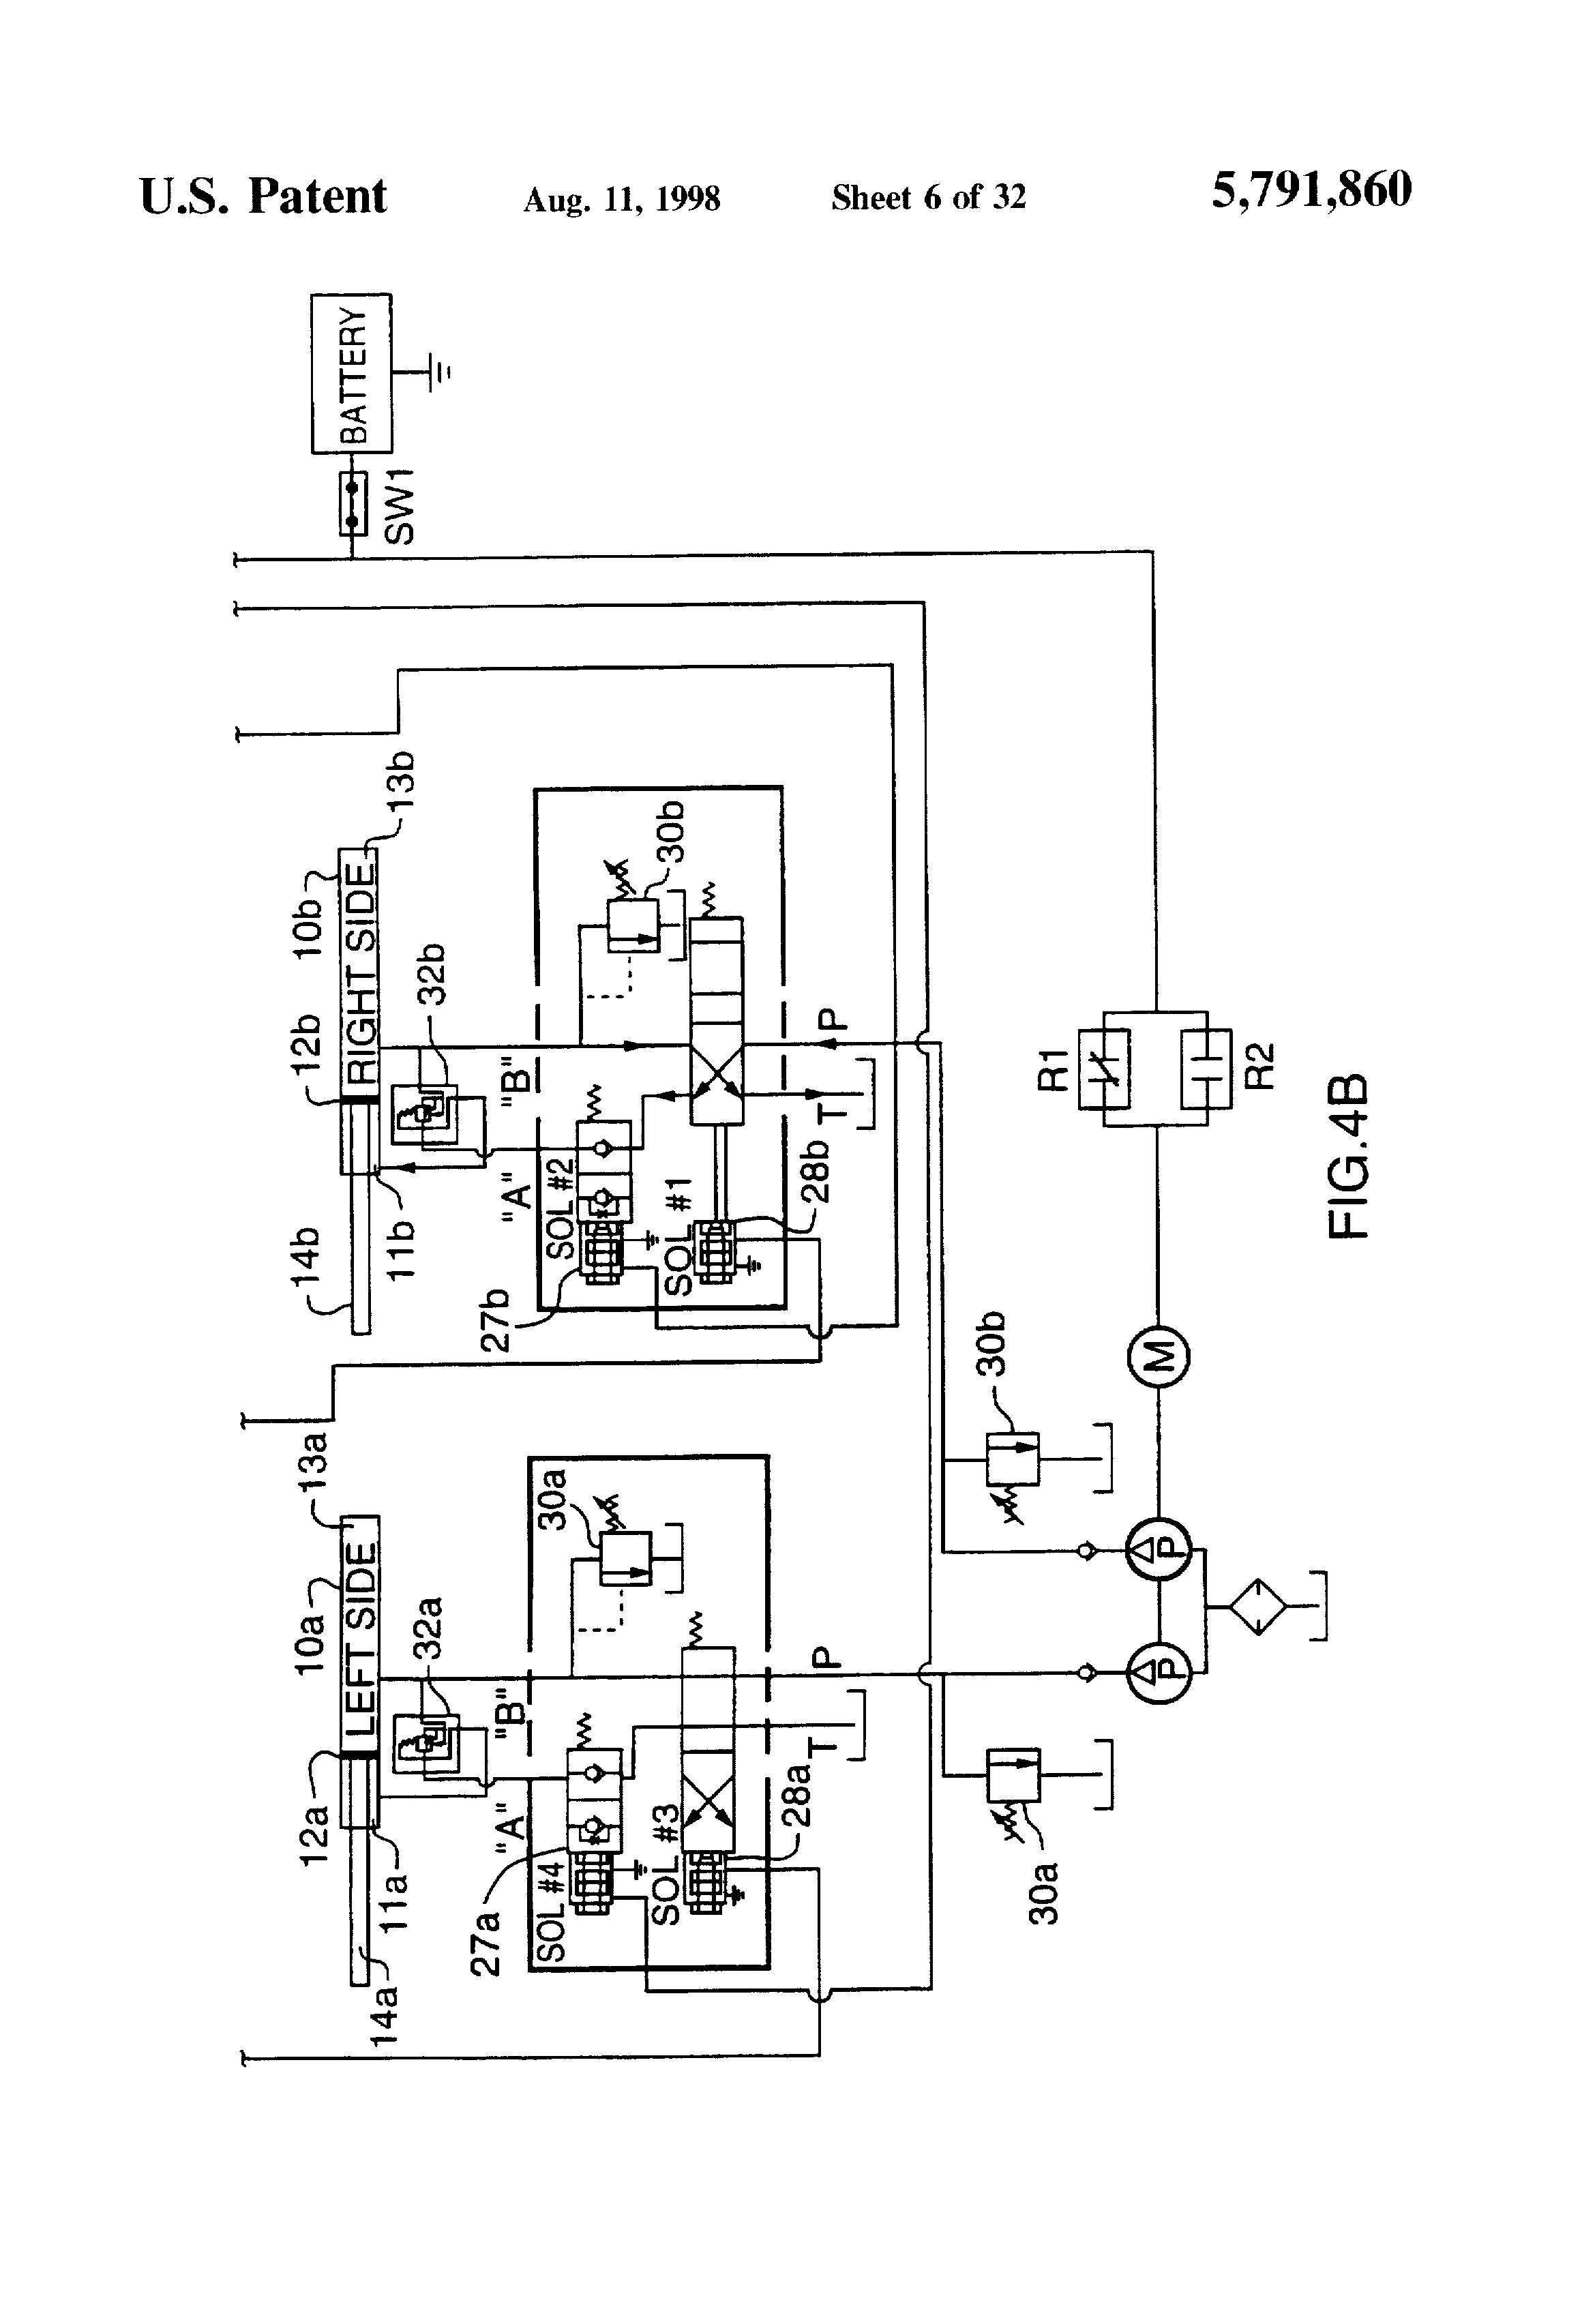 12 Volt Hydraulic Pump Wiring Waltco Liftgate Wiring Diagram from schematron.org